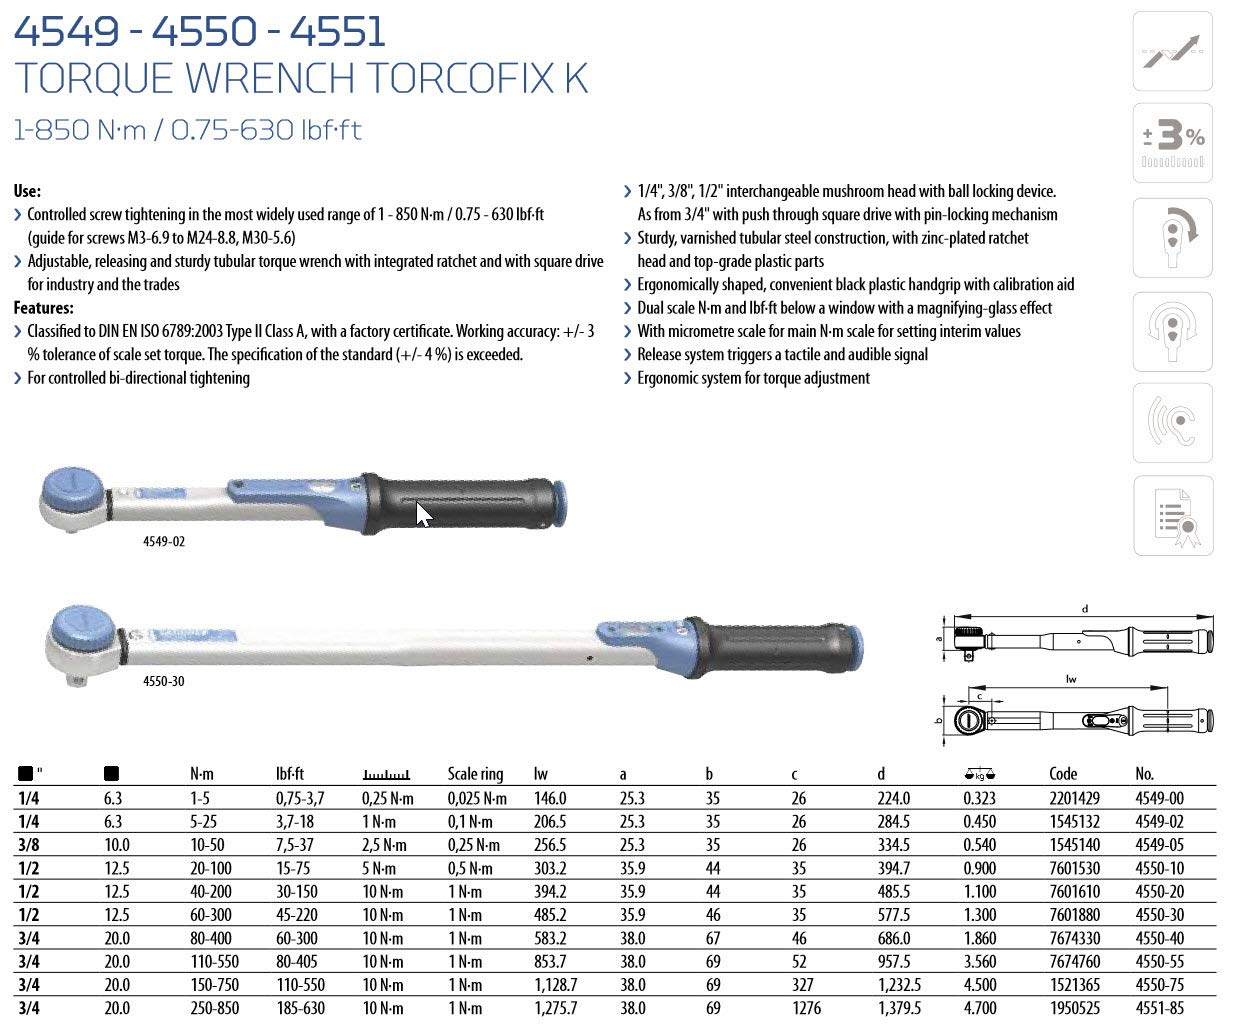 GEDORE Drehmomentschlüssel TORCOFIX K 4549-02 5-25 Nm Drehmoment Einstellen